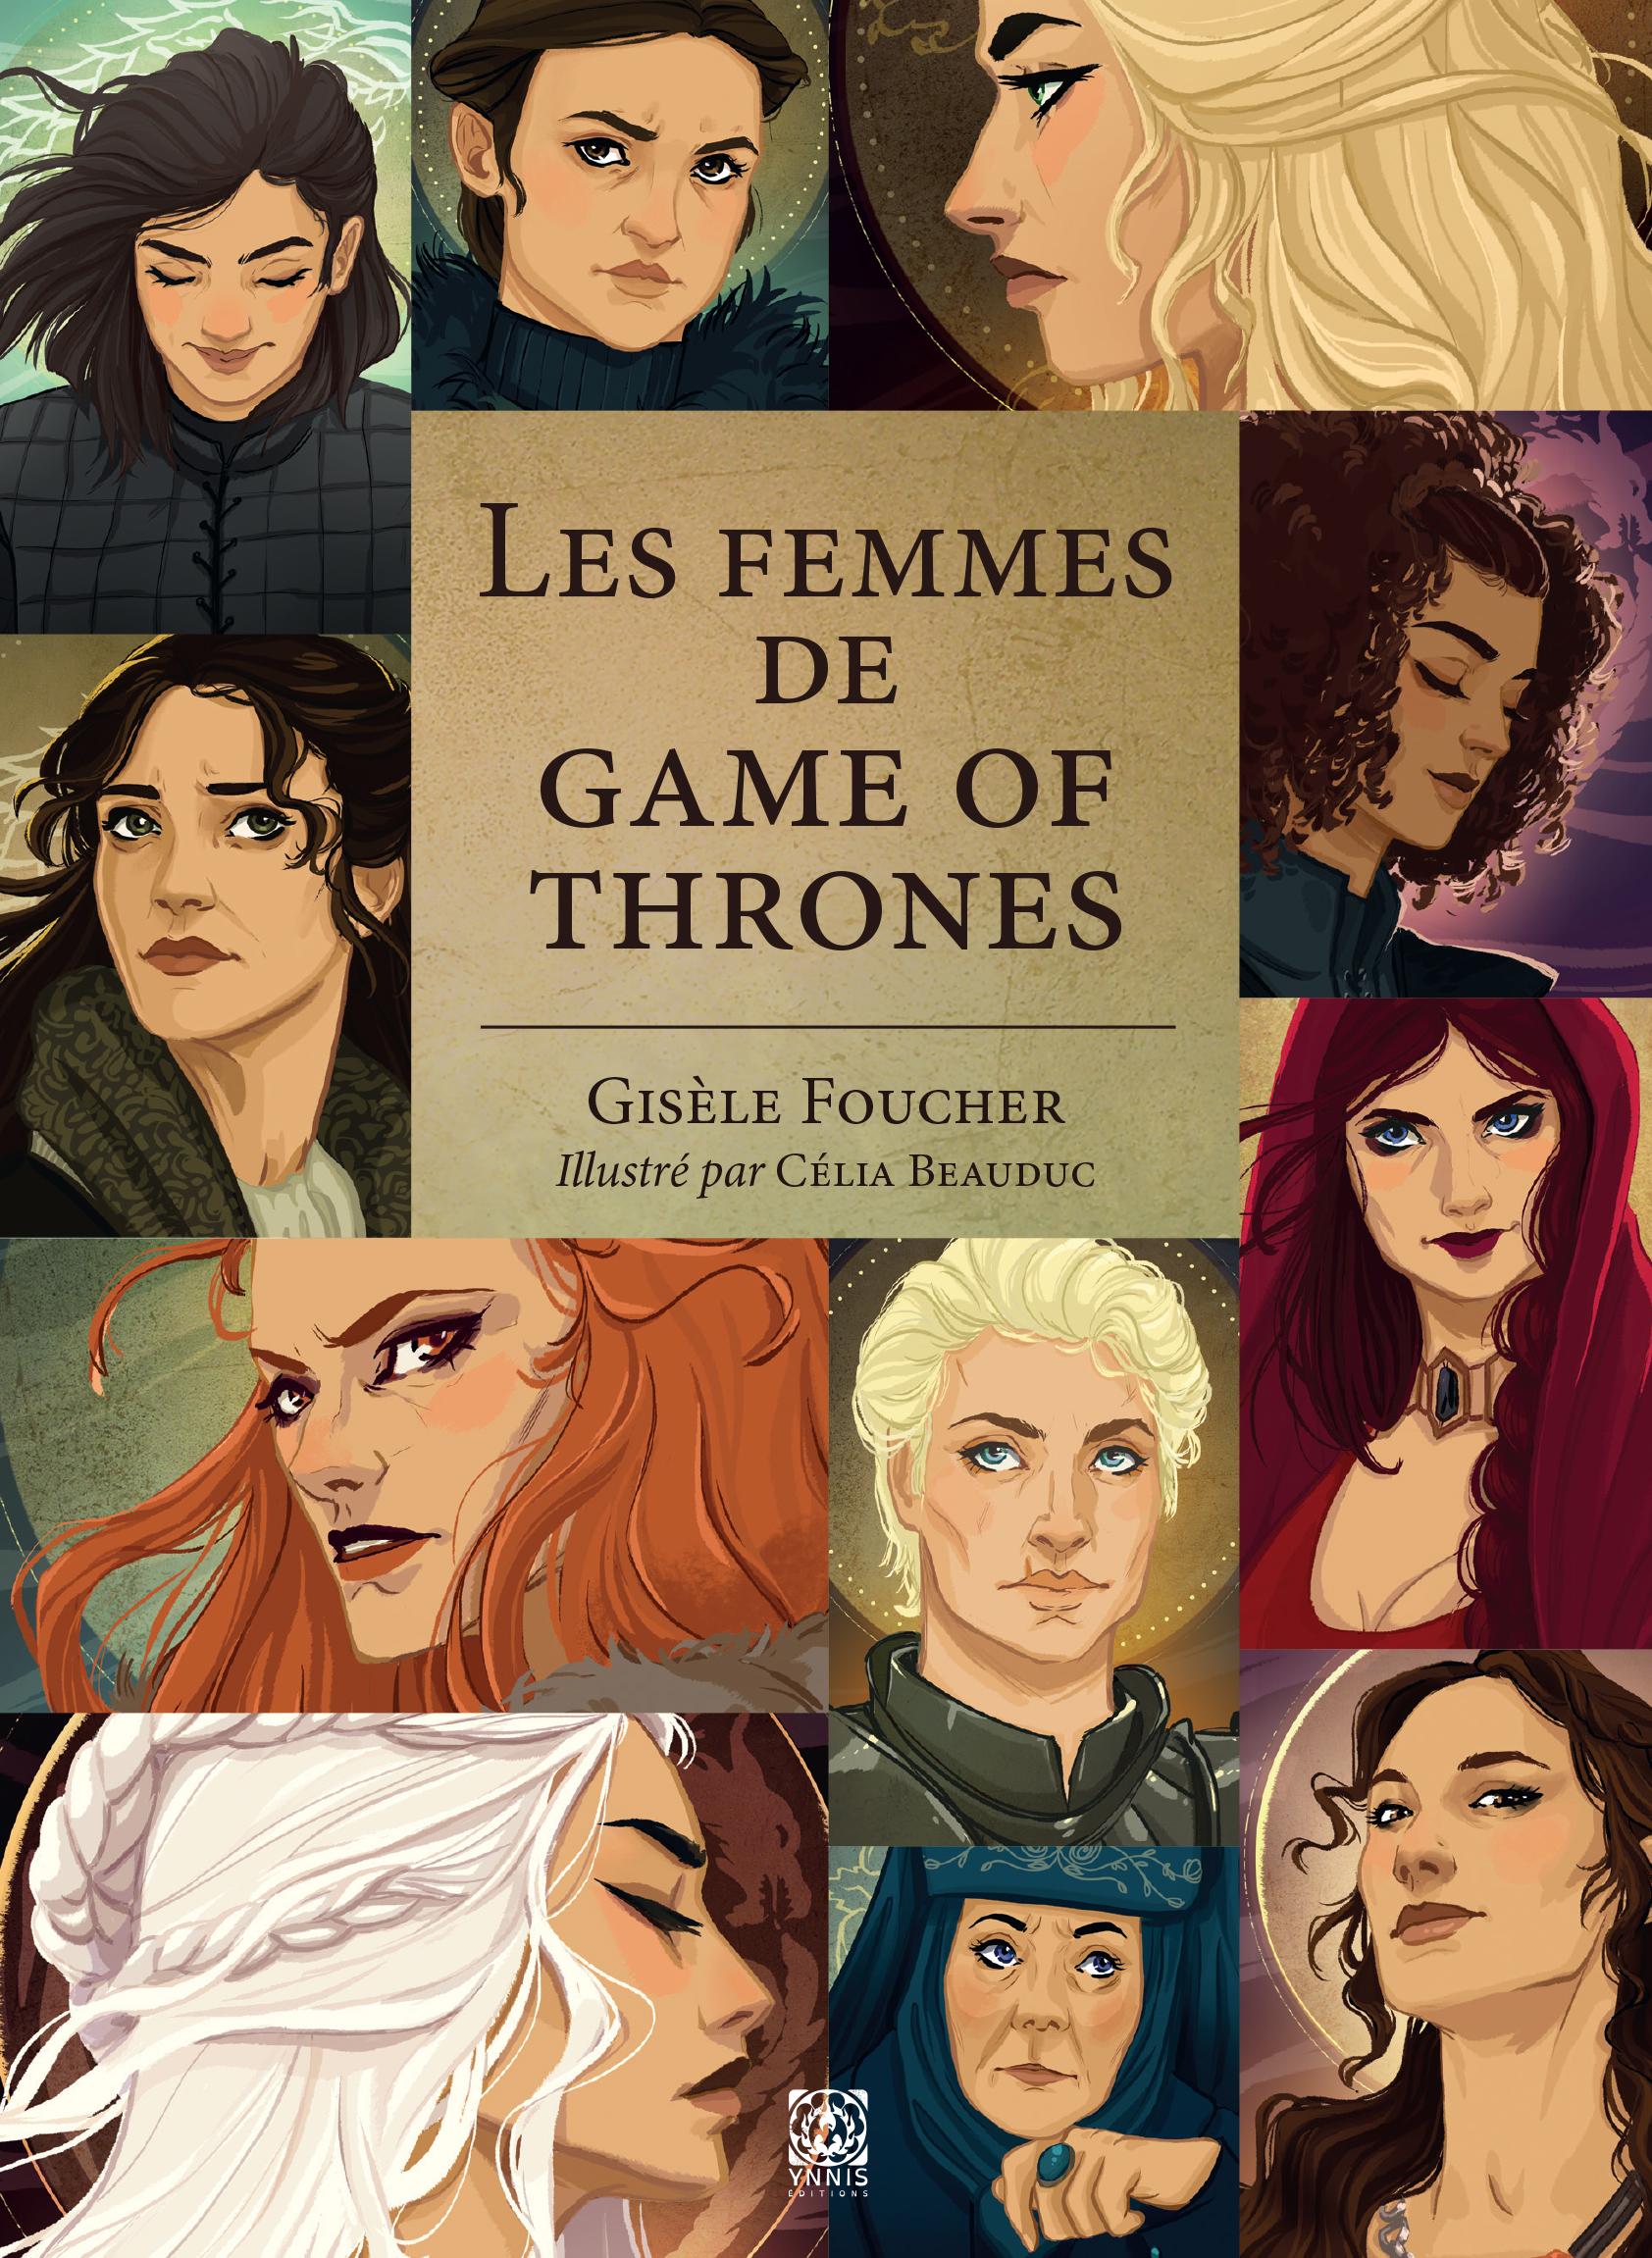 LesFemmesdeGameOfThrones_C1